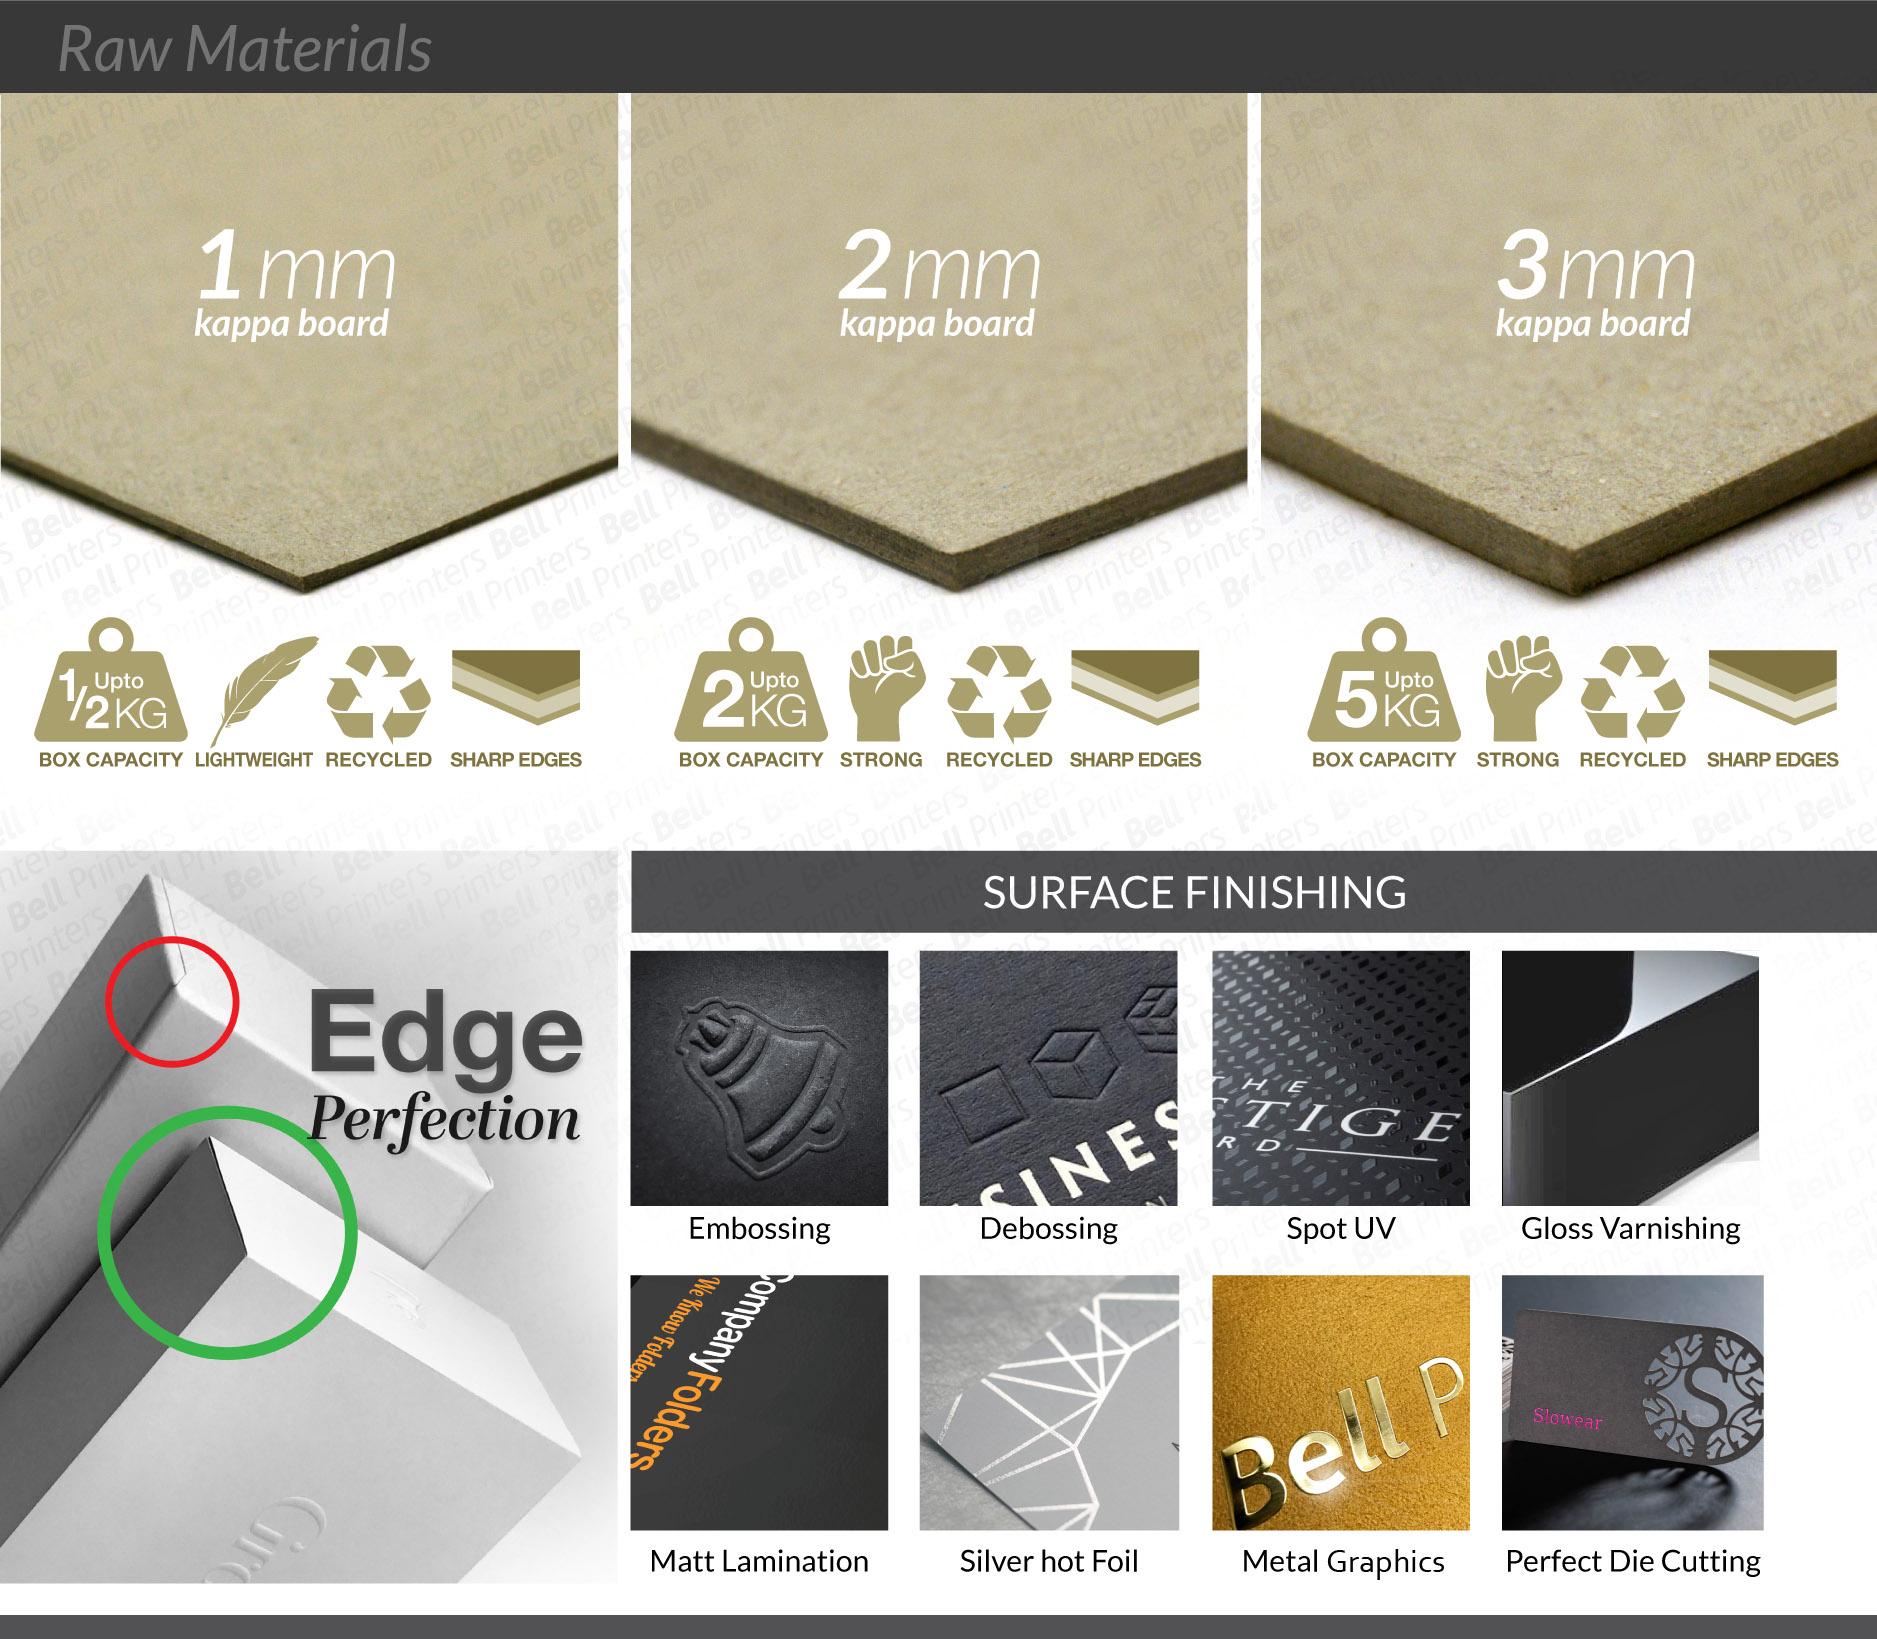 Raw-Materials-for-Rigid-Box